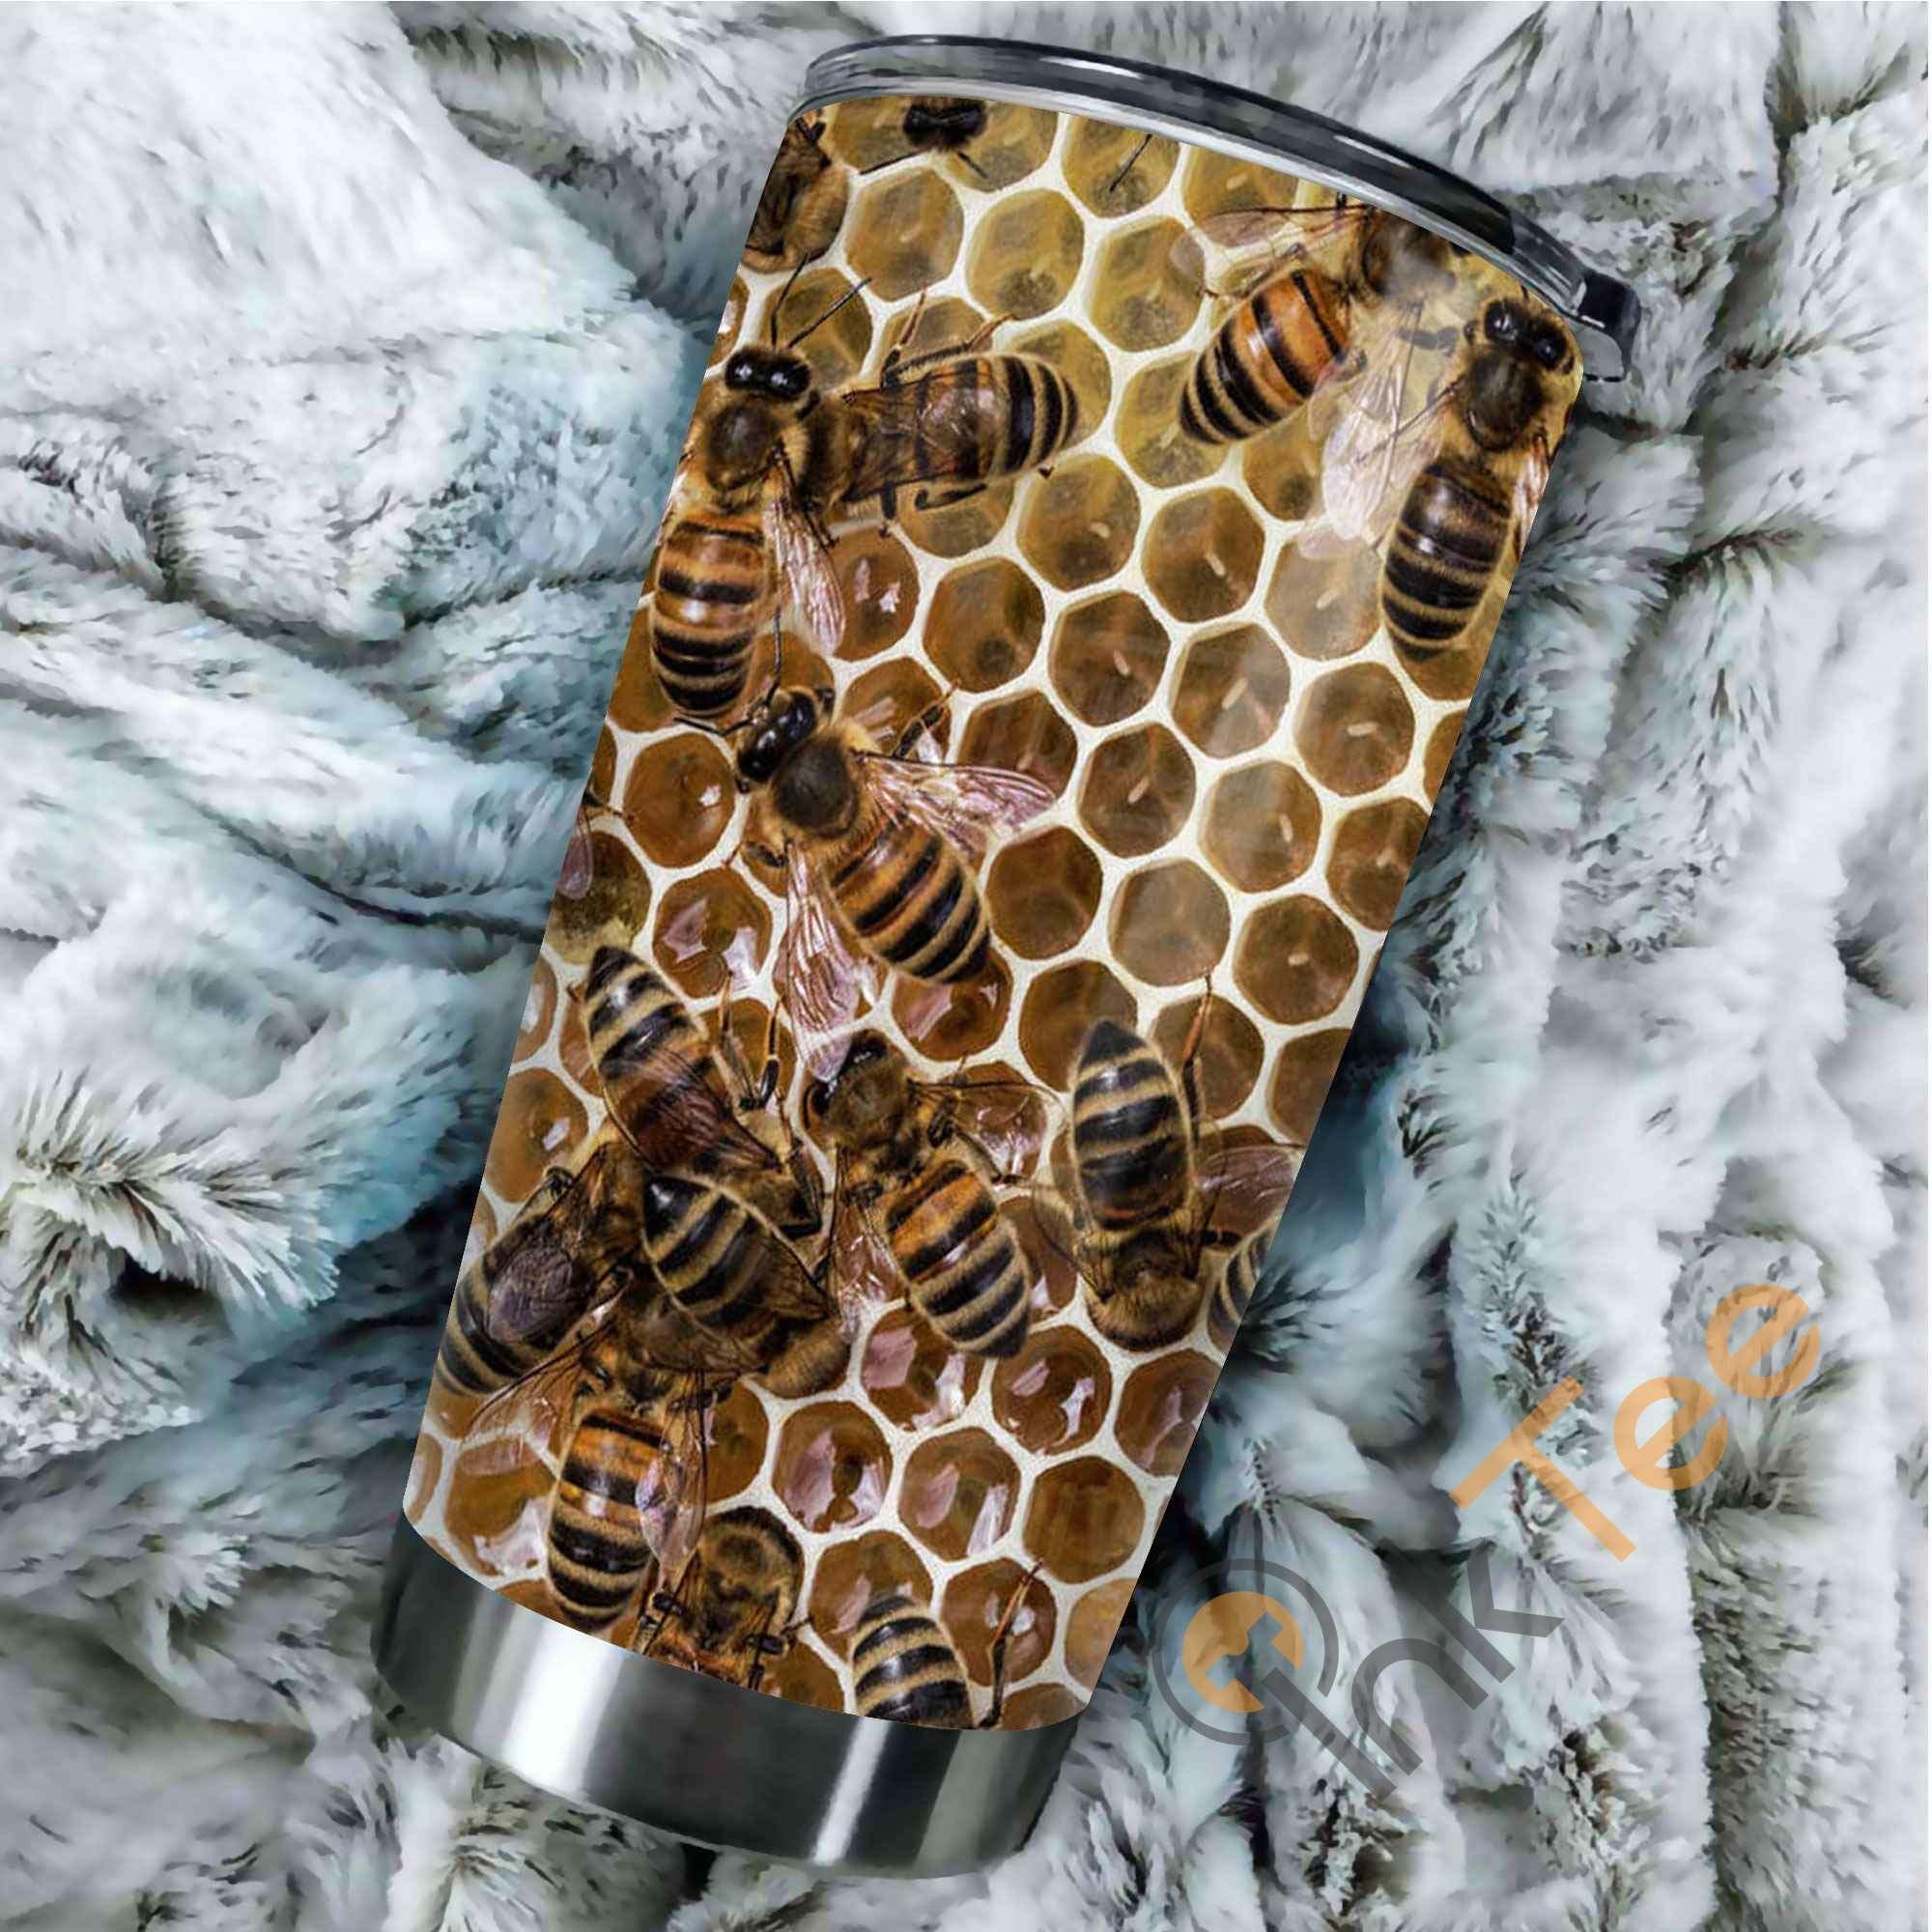 Bees Hive Amazon Best Seller Sku 2522 Stainless Steel Tumbler